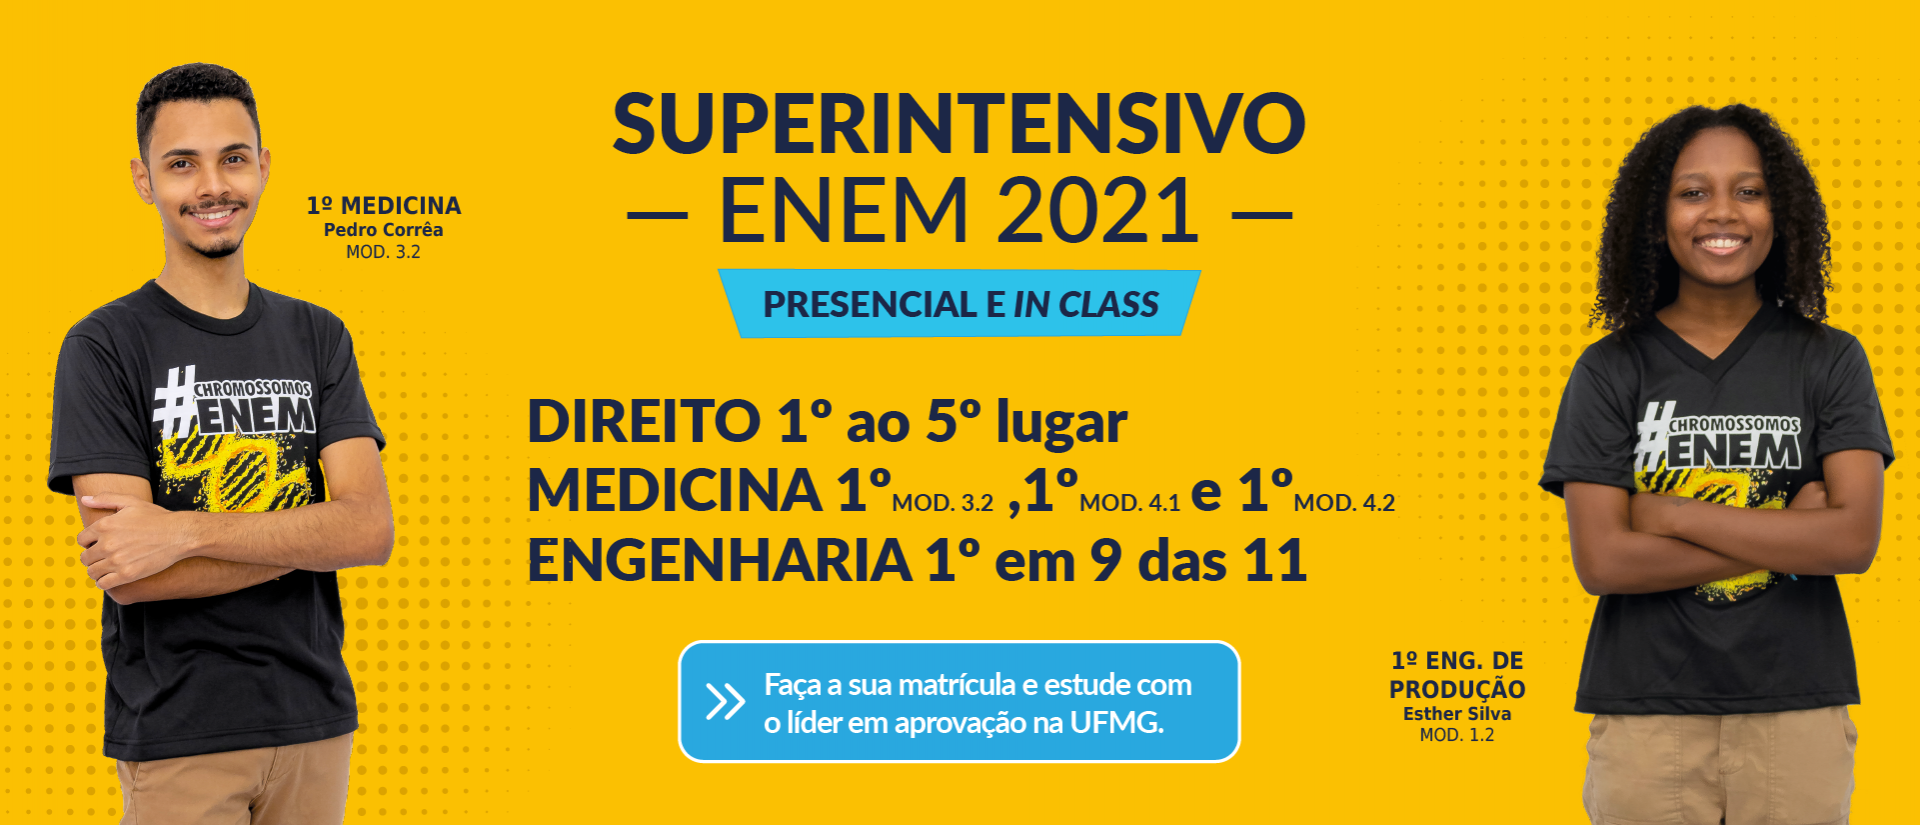 20-08 Pre ENEM-SuperIntensivo 2021-01_Banner-rotativo copy